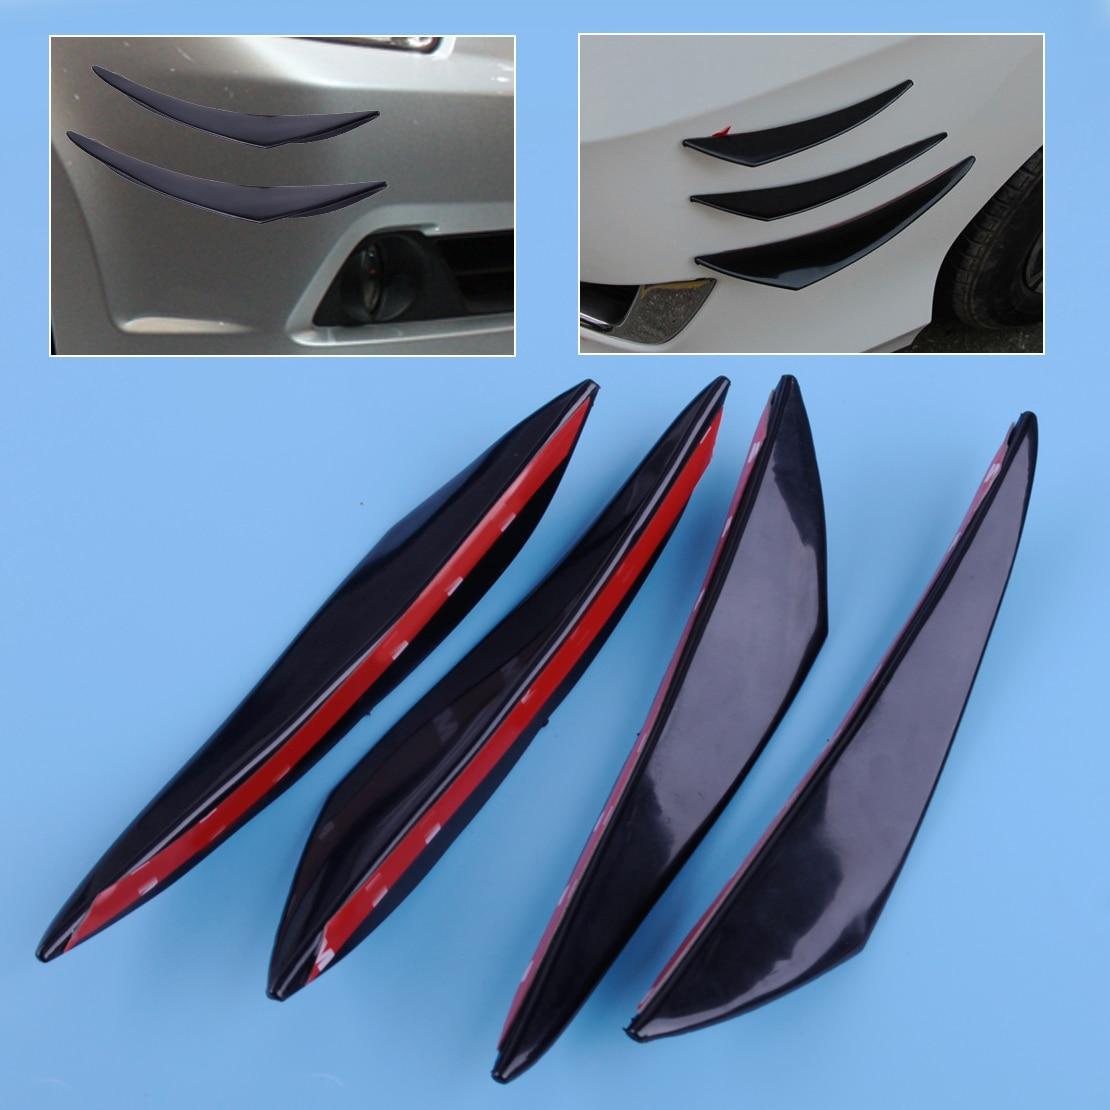 beler 4pcs PU Rubber Universal Large Car Front Bumper Protector Body Spoiler Fins Lip Canards Splitter